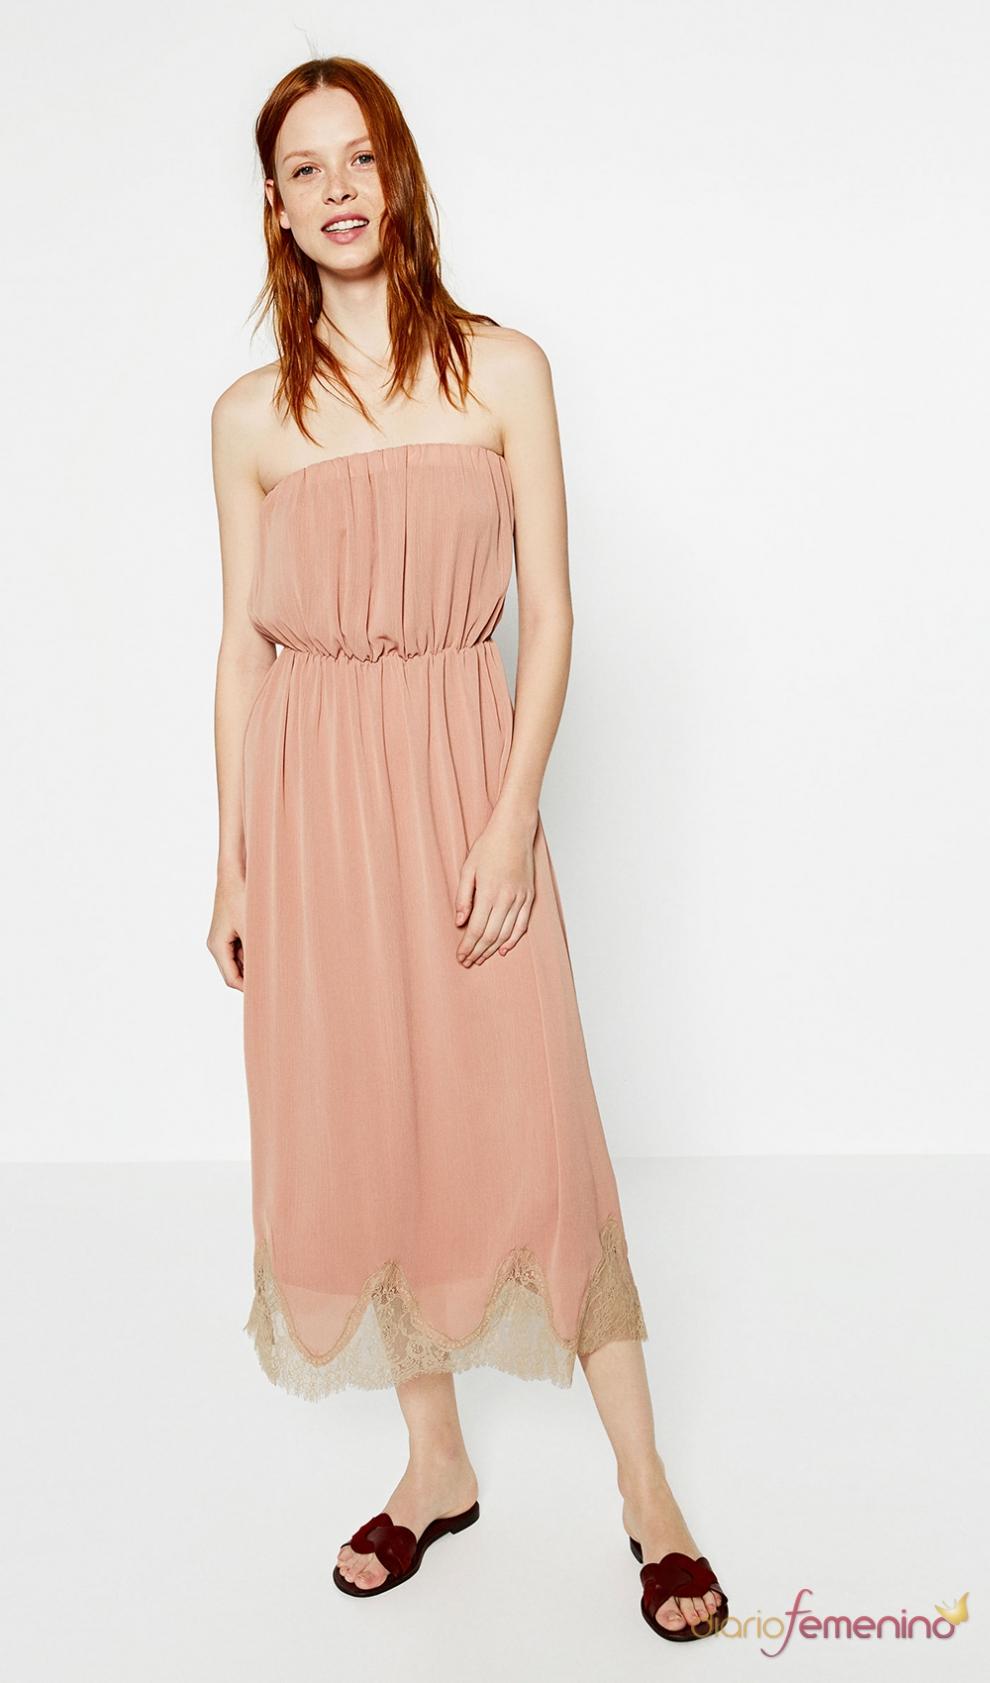 de boda embarazadas: un vestido bohemio de ZARA